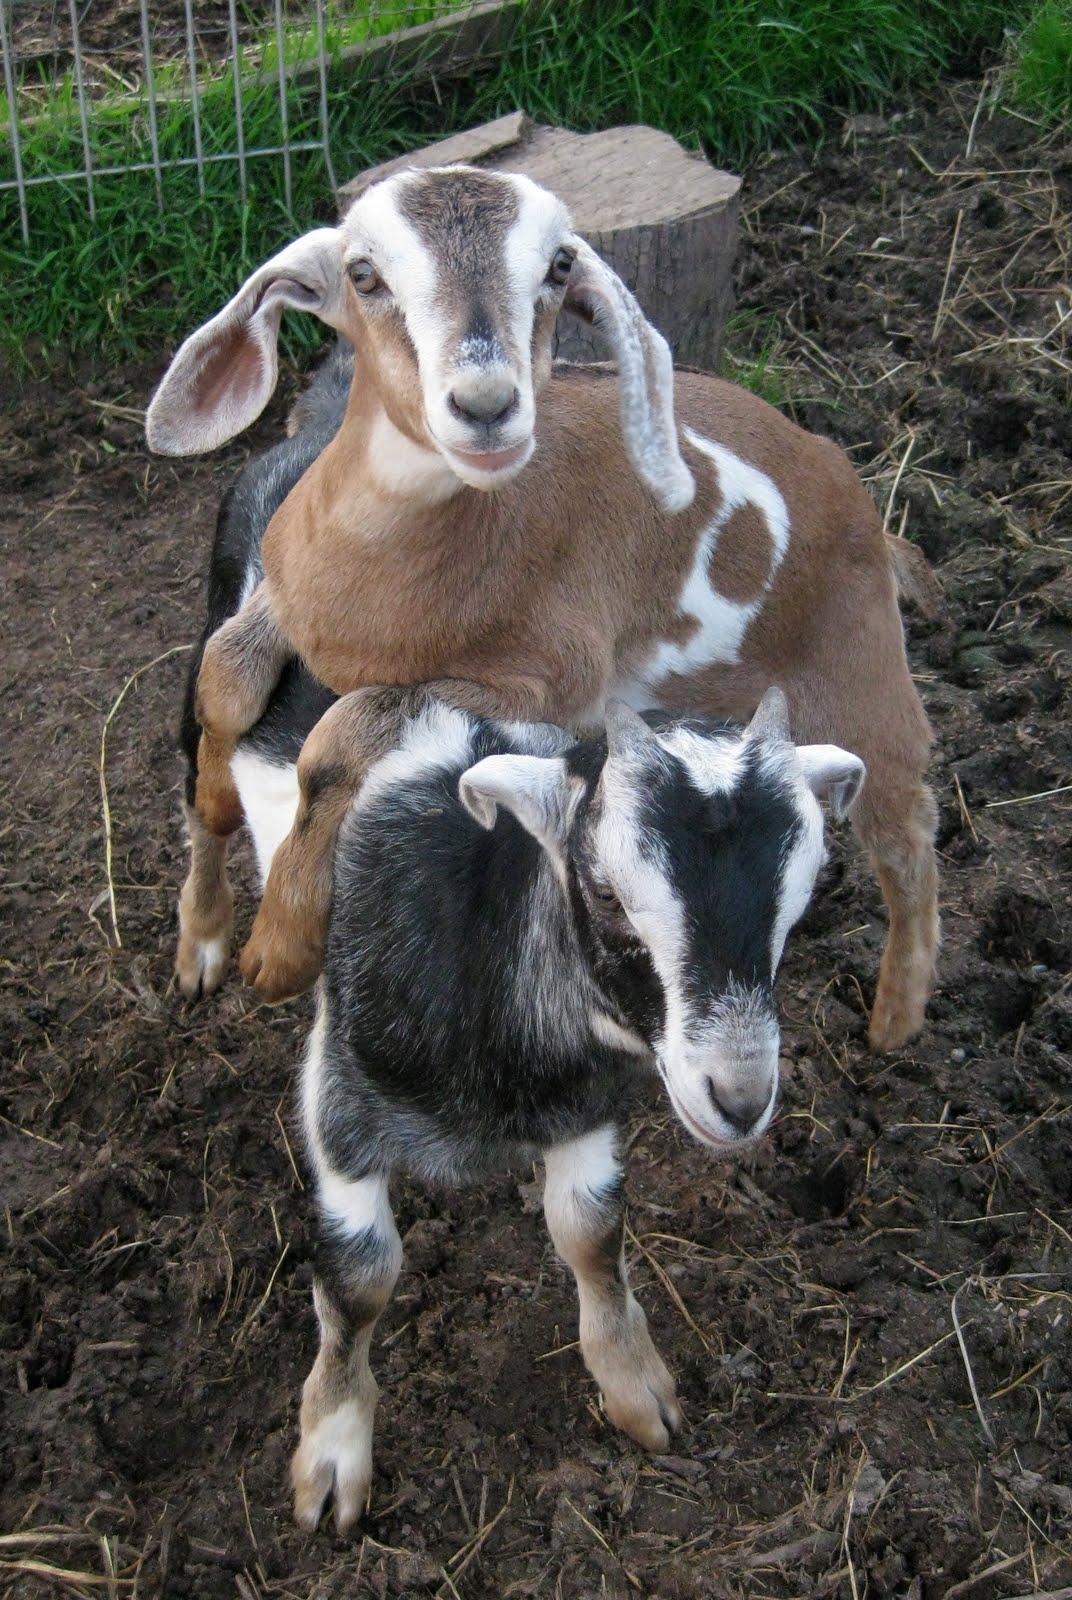 Solar Living Urban Homesteading How to Raise Backyard Goats